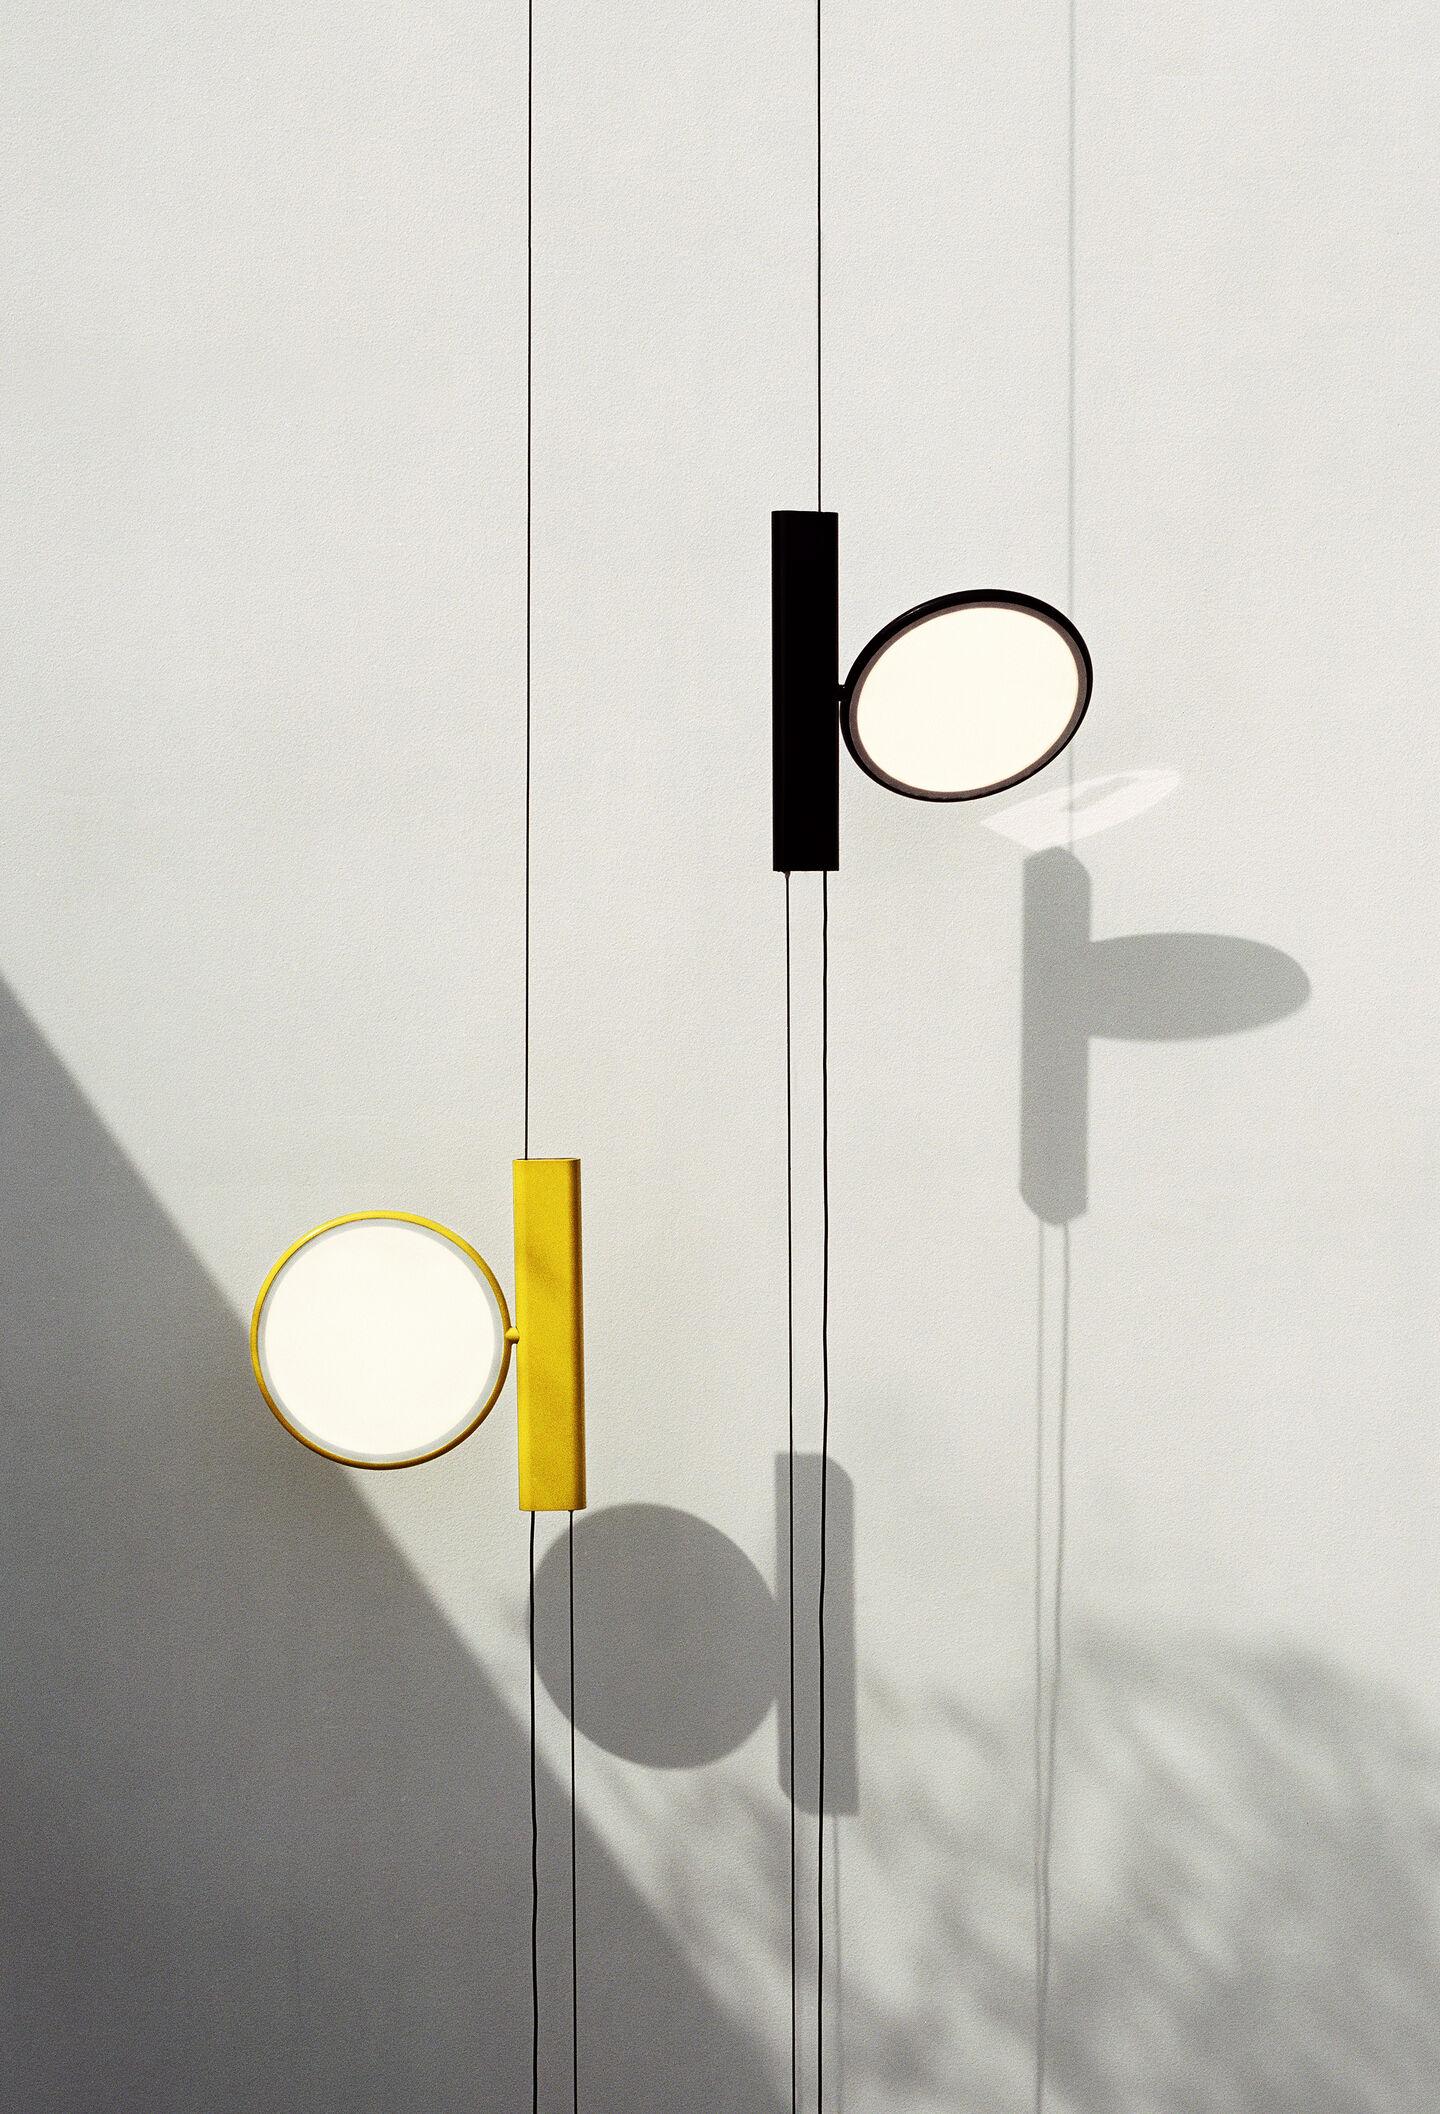 designers-konstantin-grcic-flos-15